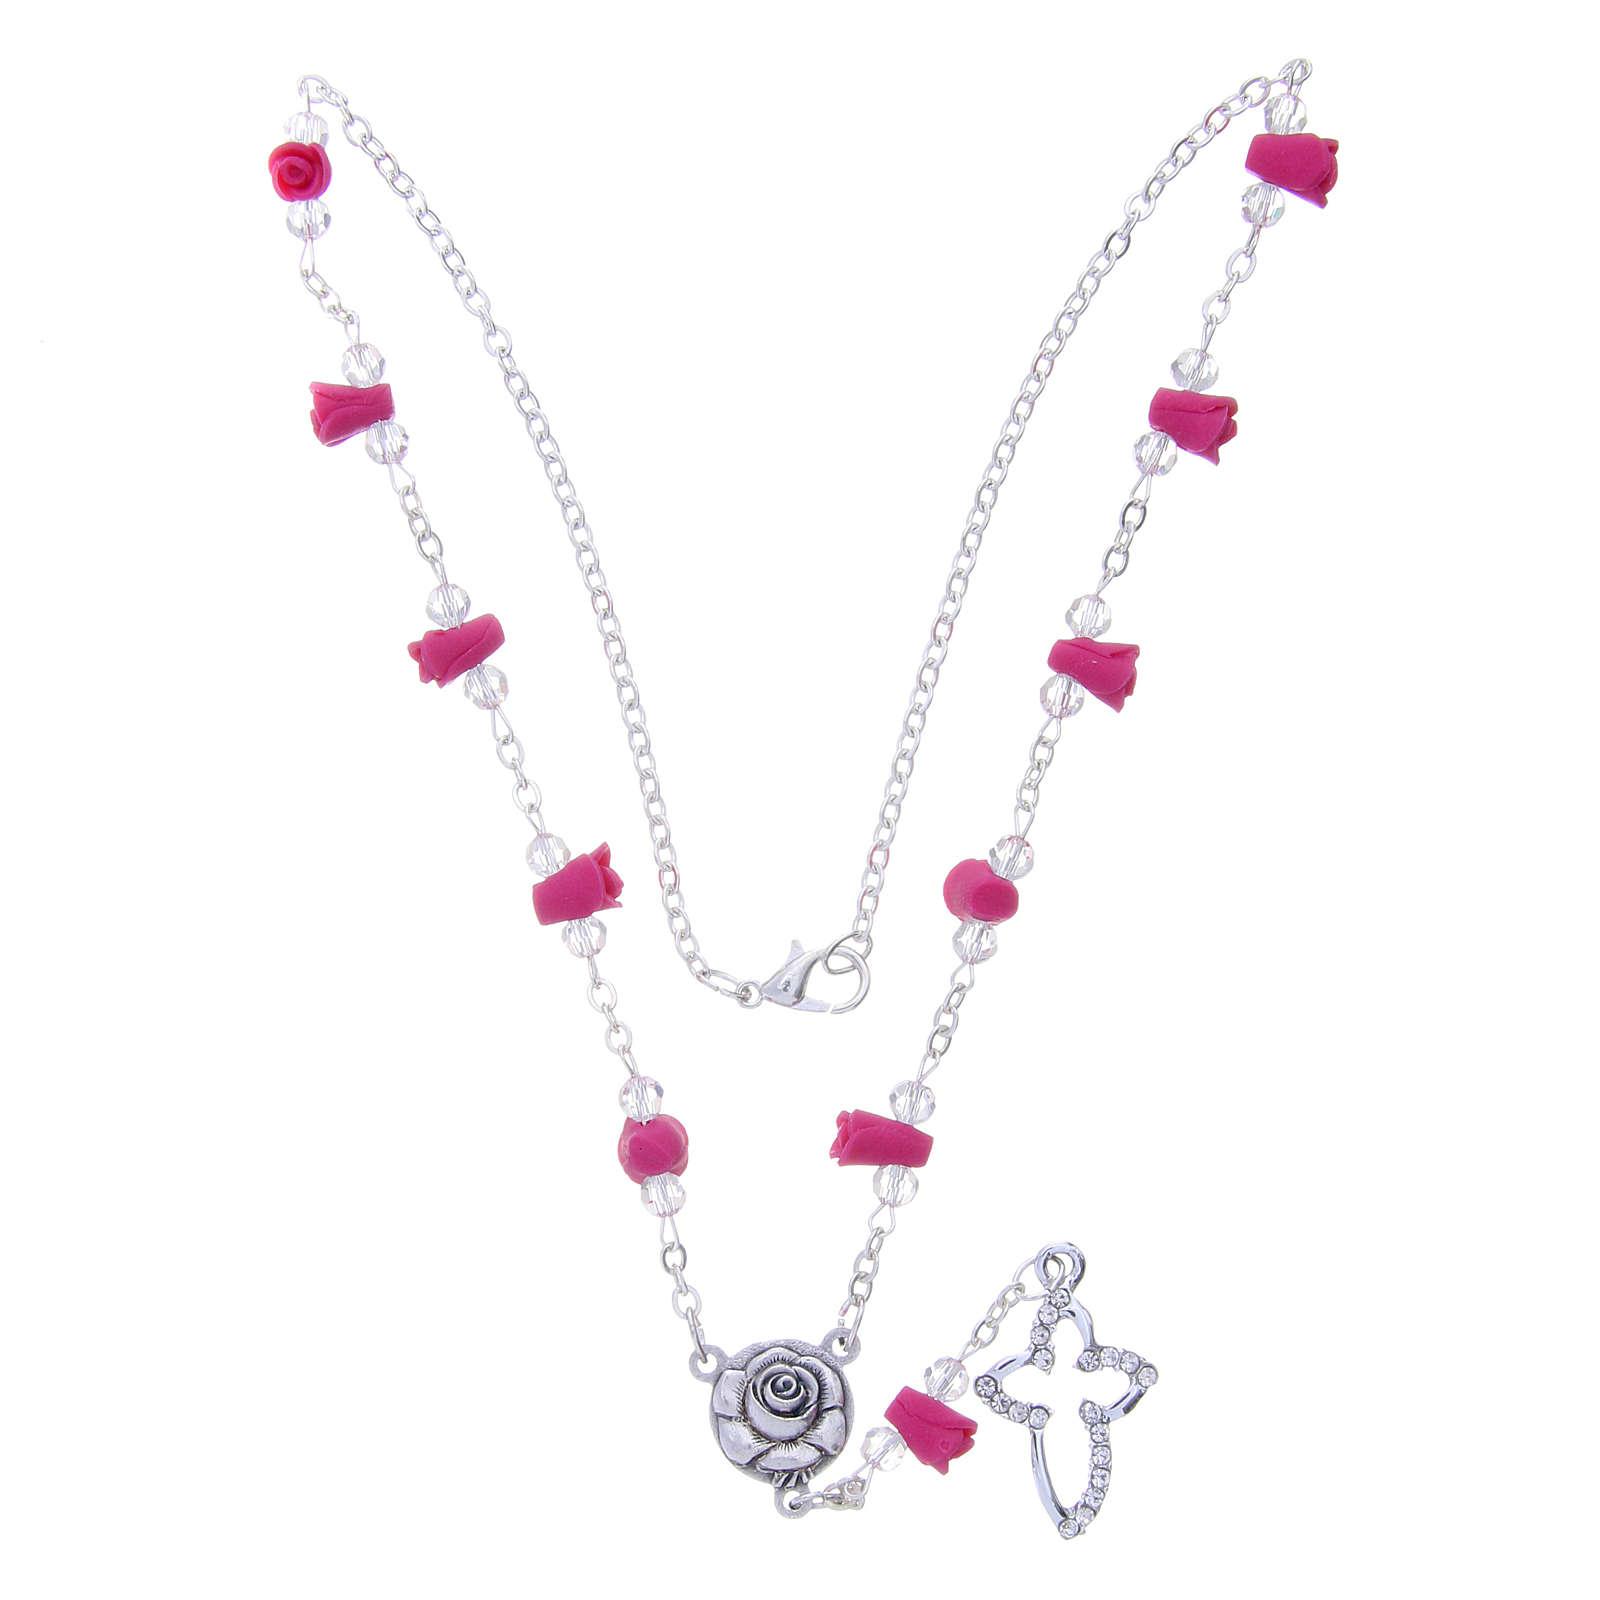 Collar rosario Medjugorje rosas fucsia cerámica cuentas cristal 4